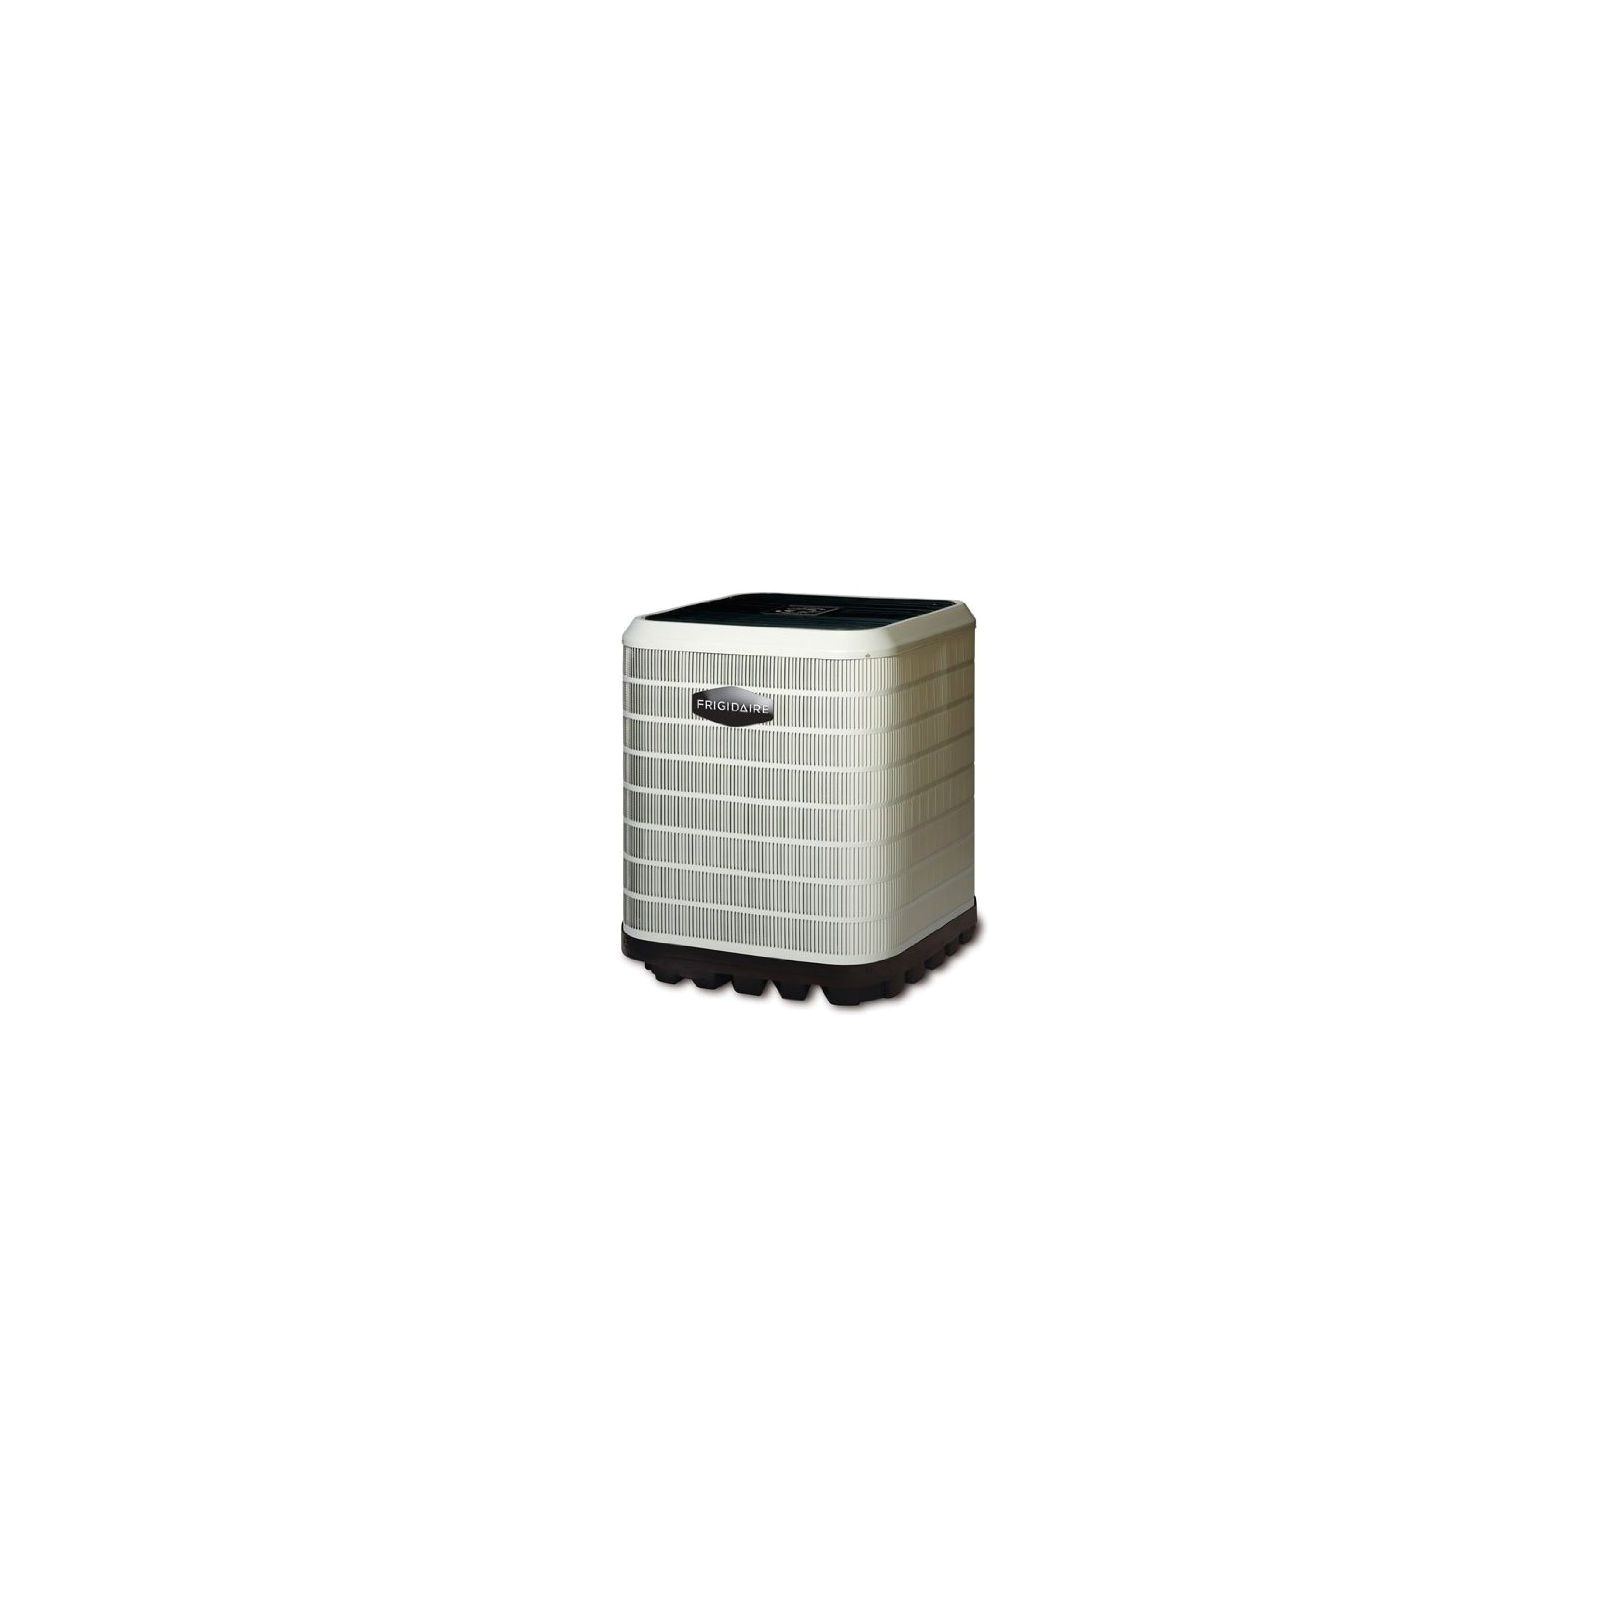 frigidaire 920602e es4bd 030kb 2 1 2 ton 13 seer high efficiency air conditioner r410a